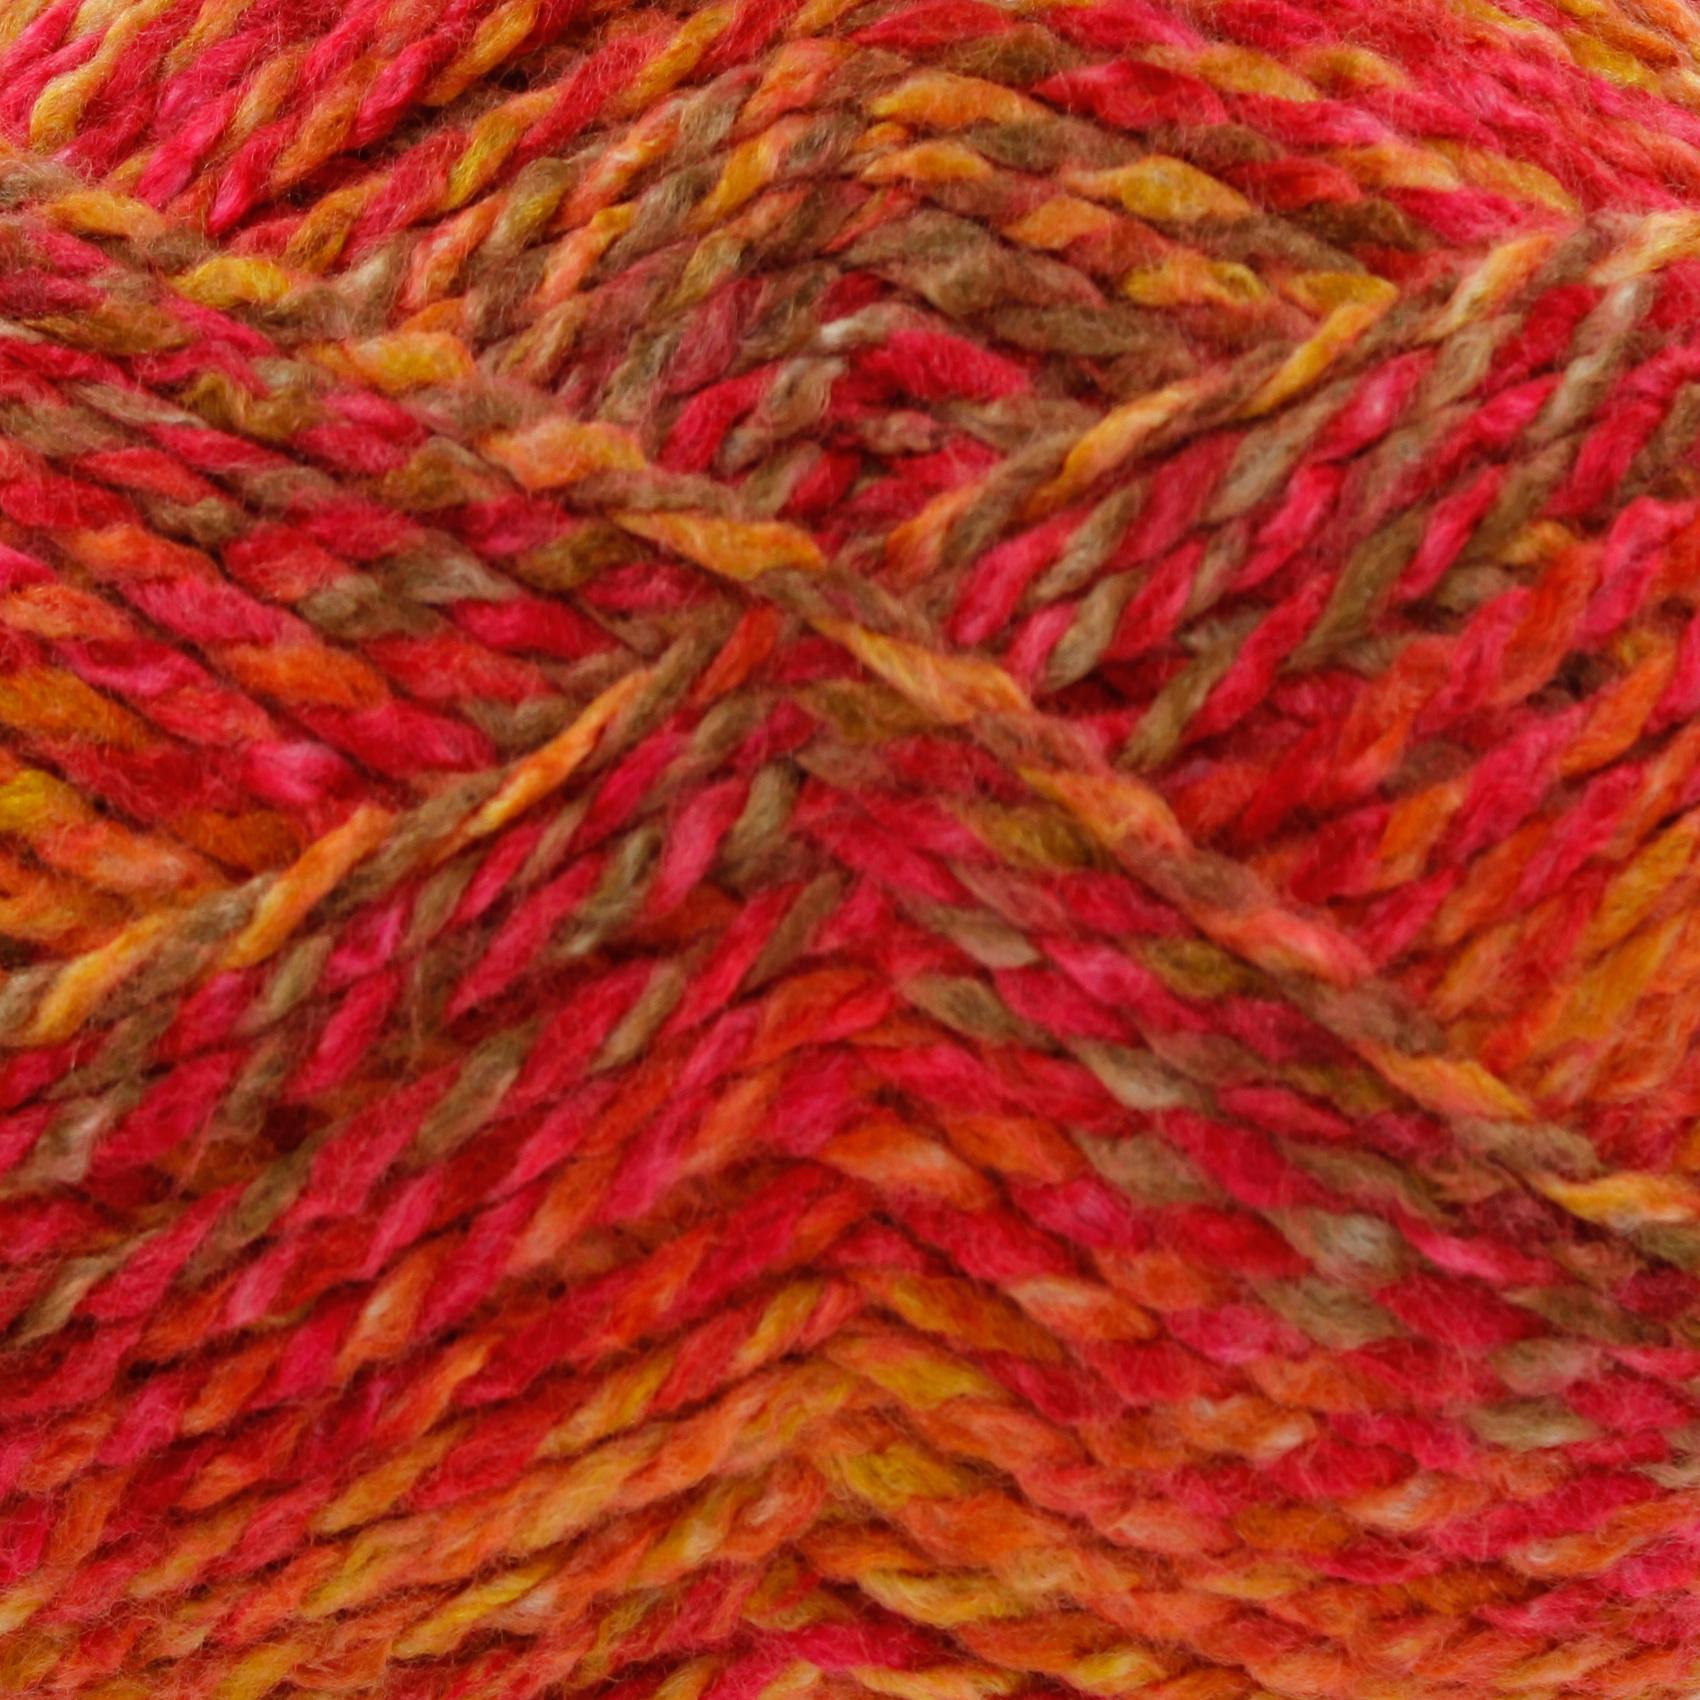 Chunky Knitting Wool Uk : King cole corona chunky knitting yarn super soft premium